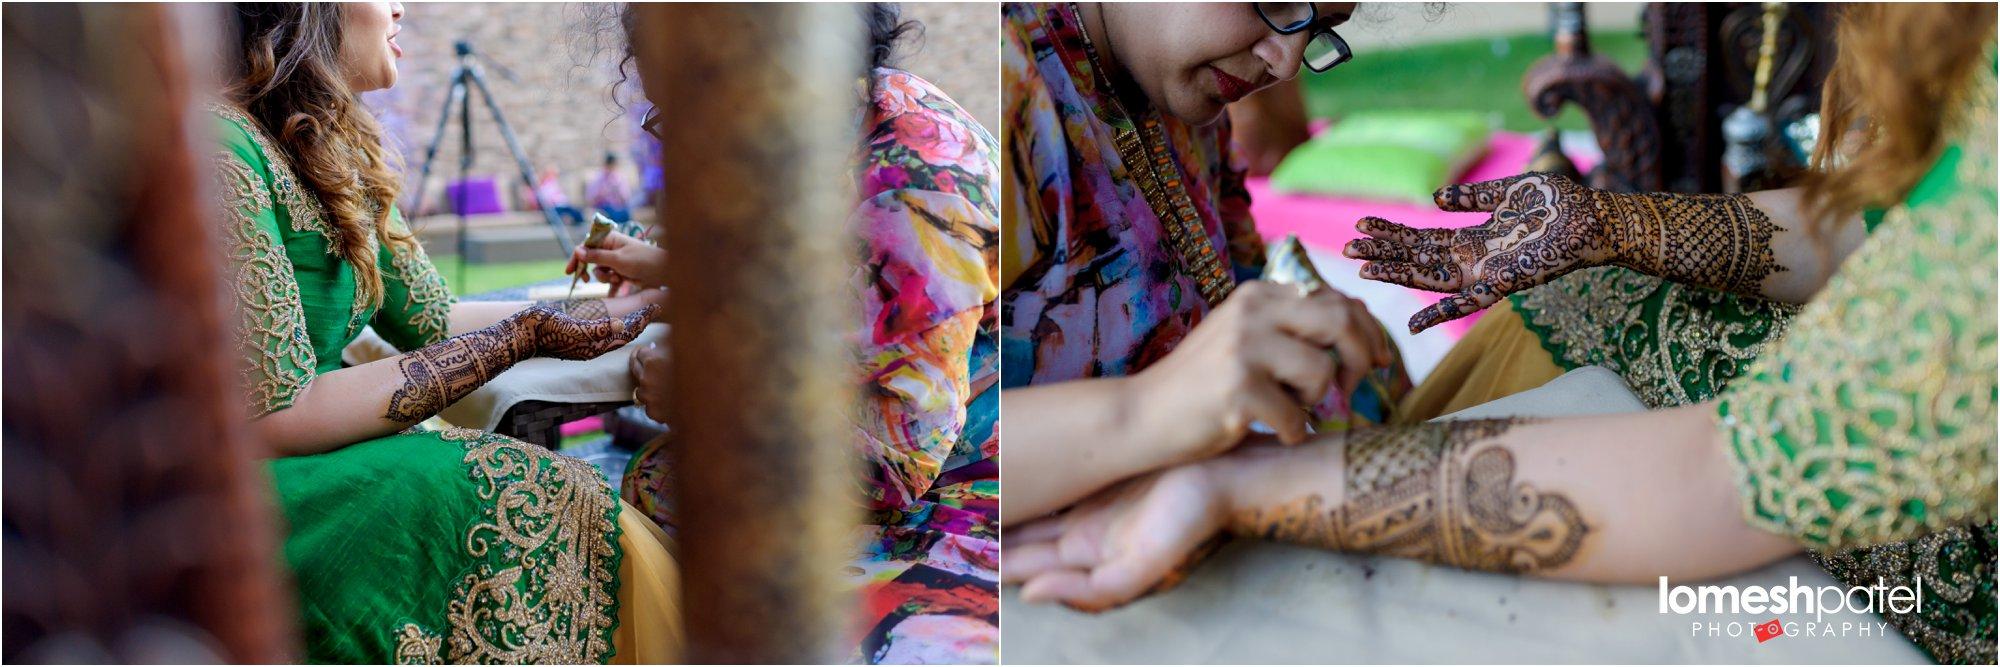 dallas_indian_wedding_0036.jpg